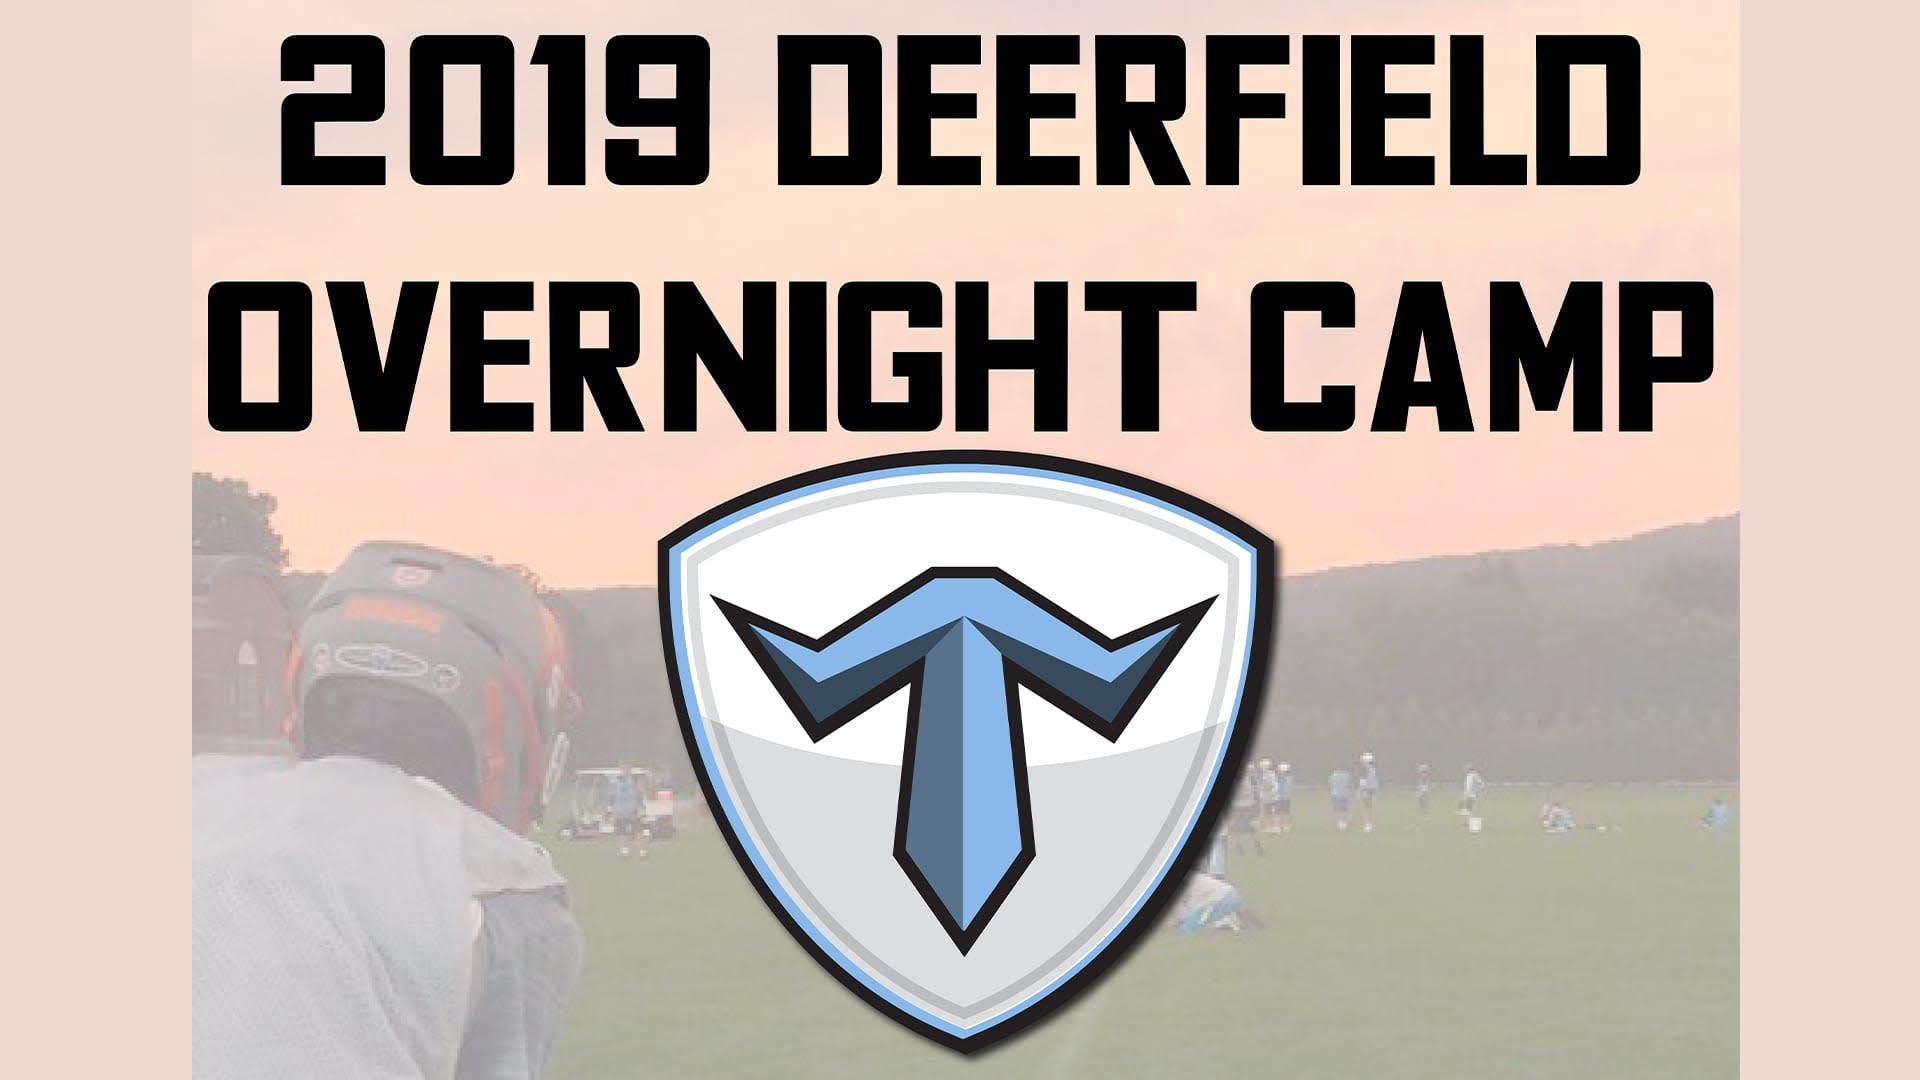 deerfield overnight camp